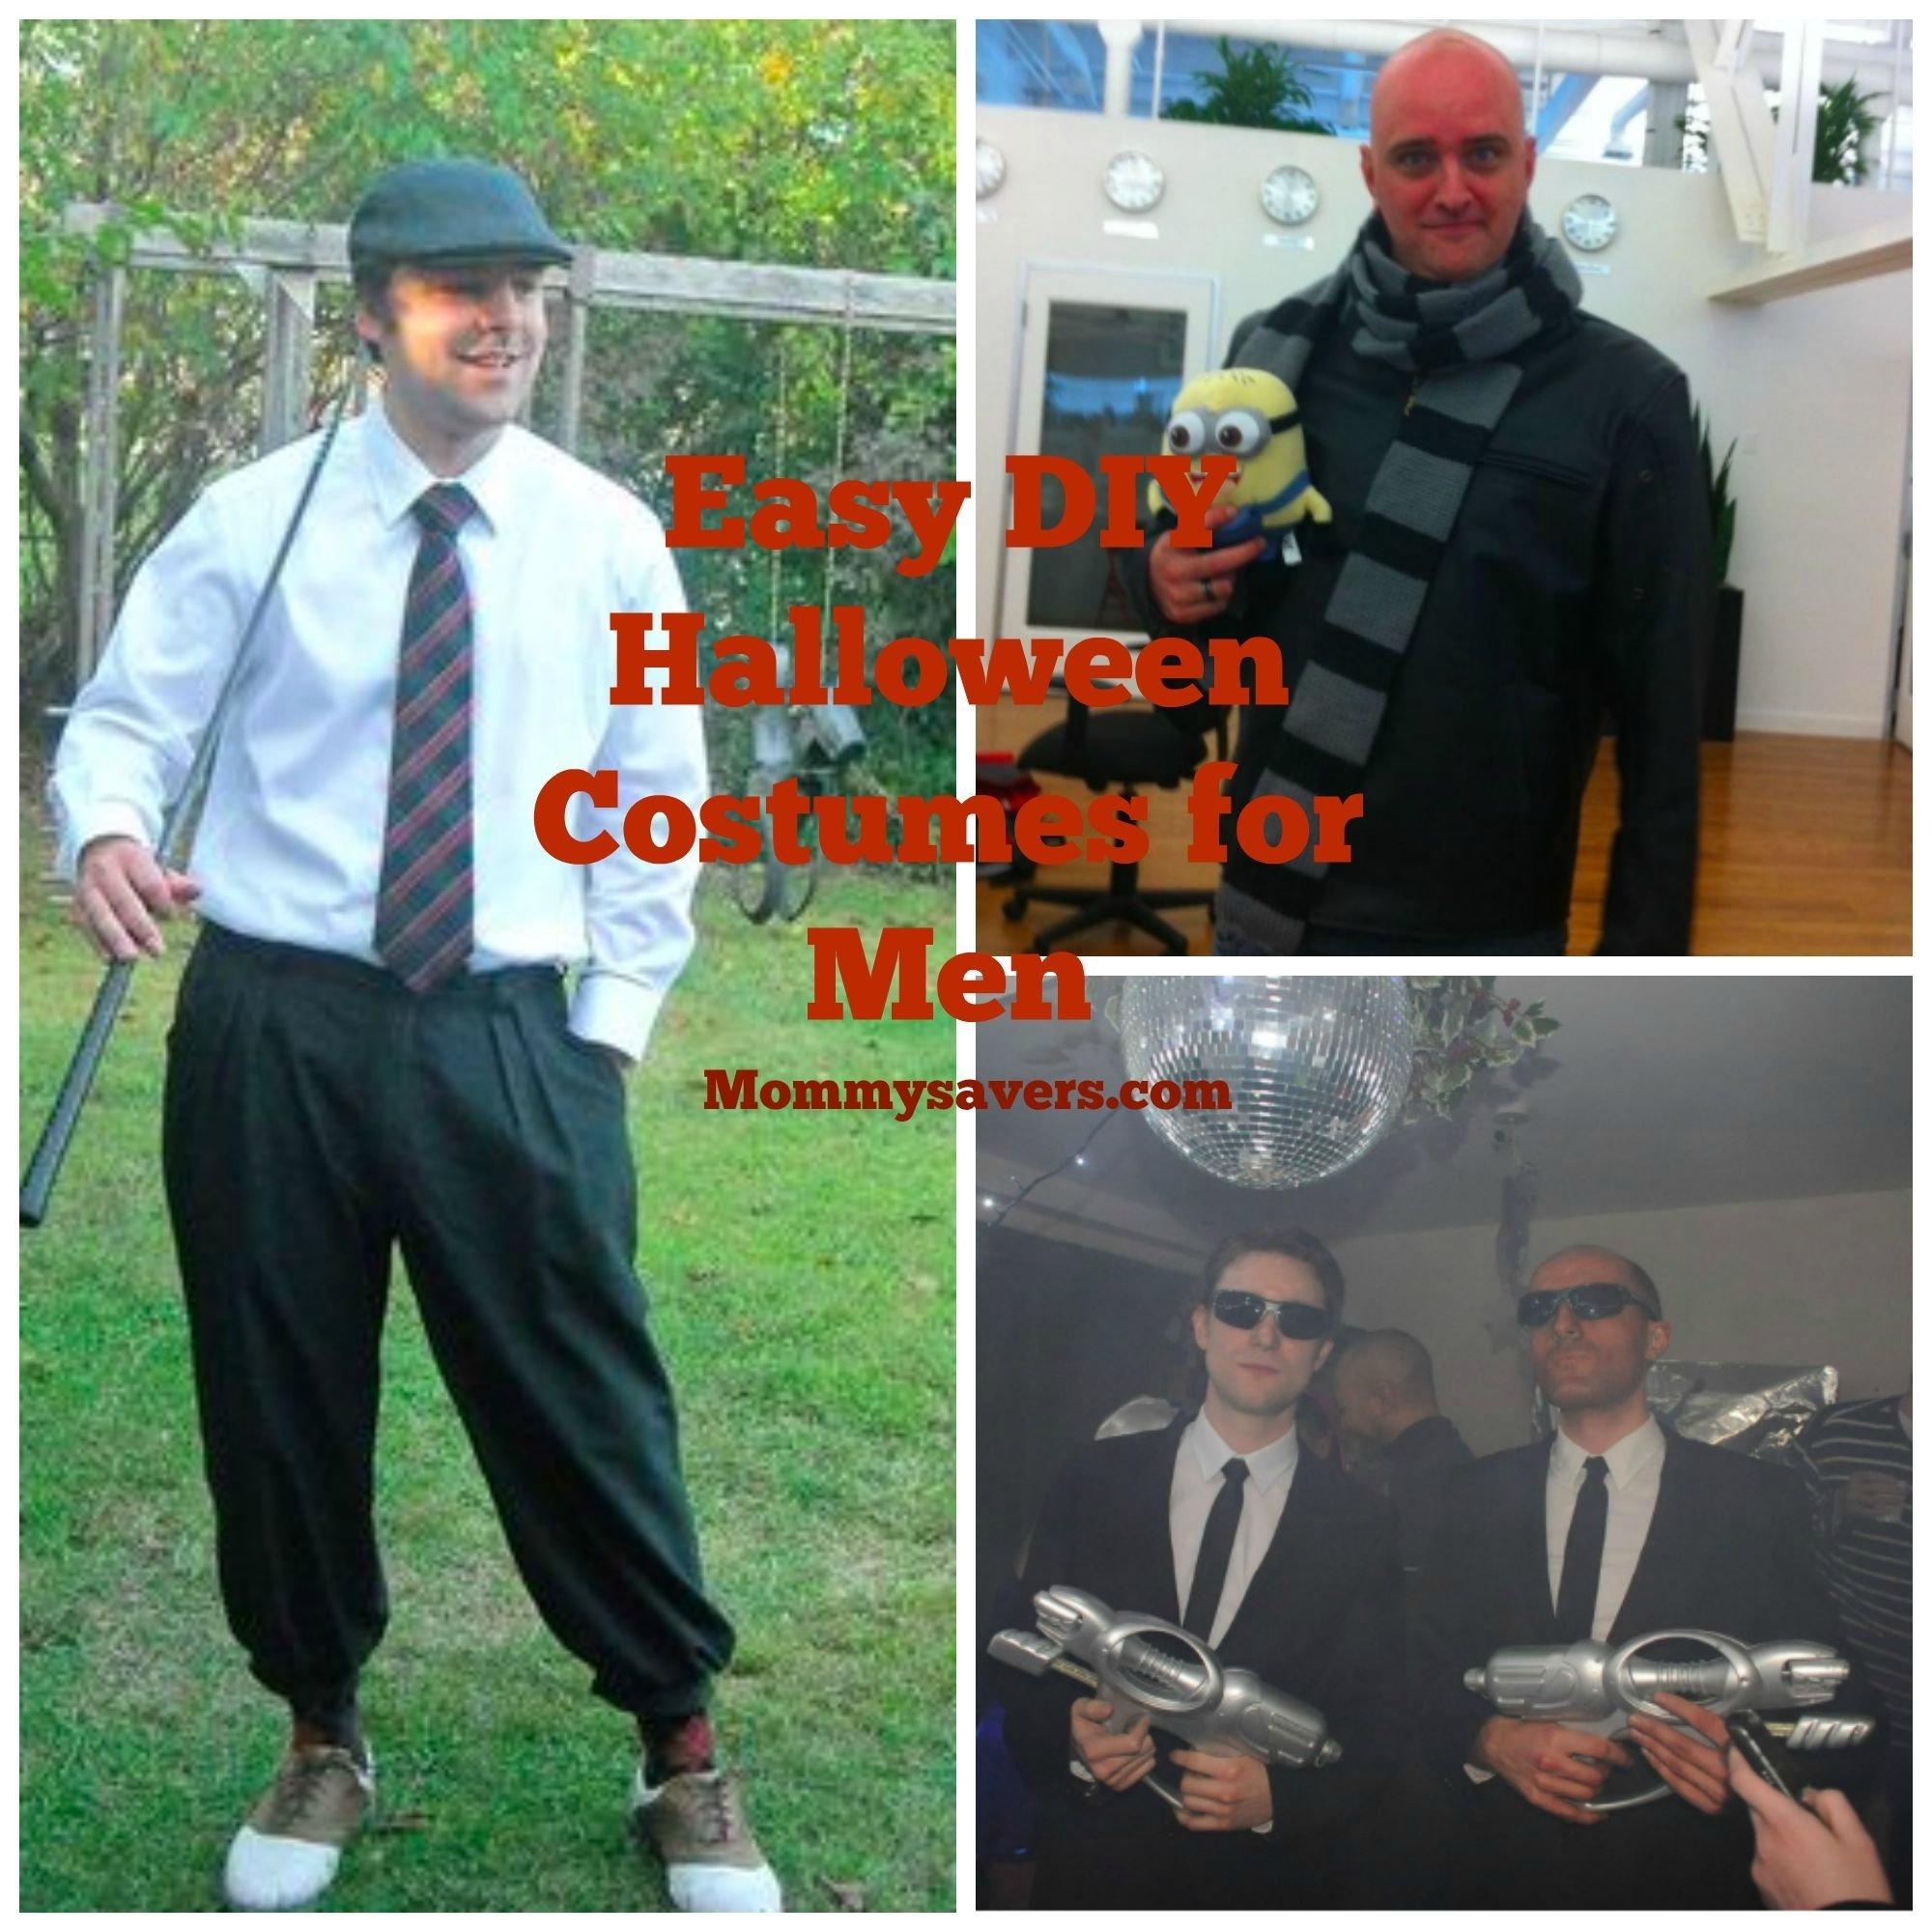 10 Wonderful Quick Costume Ideas For Men diy halloween costumes for men mommysavers 1 2021